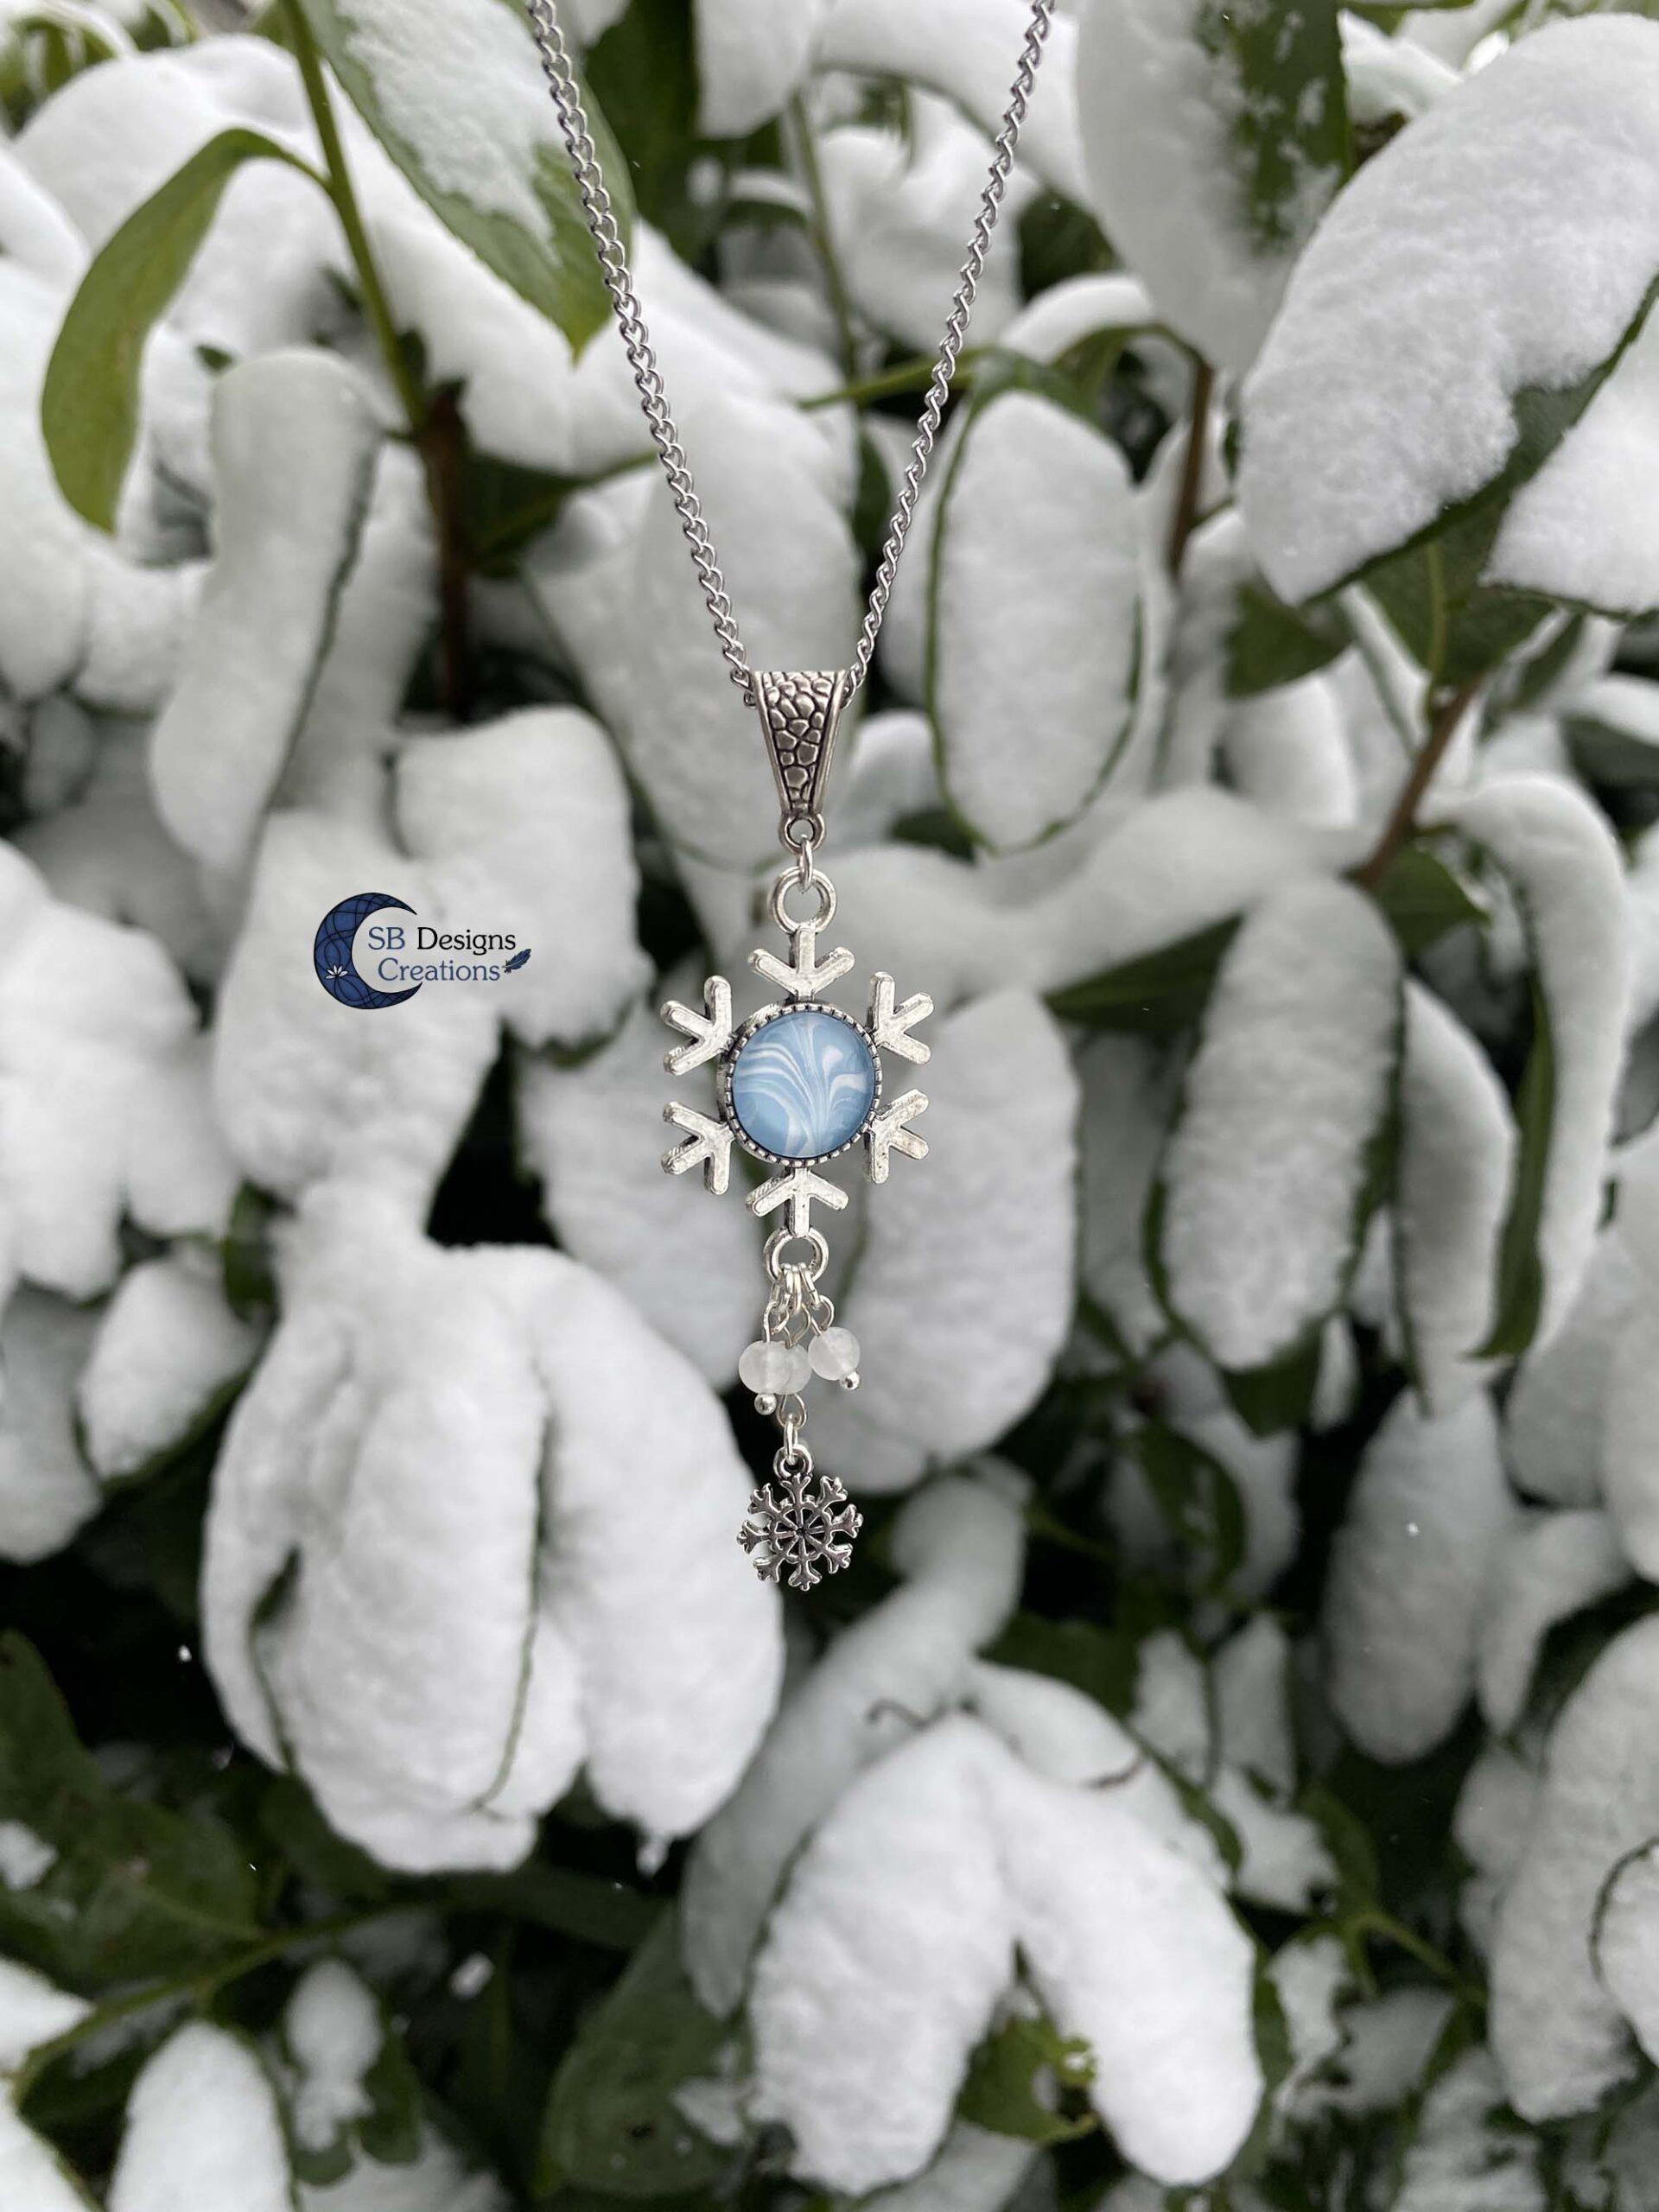 Snowflake-Necklace-Winter-Wonderland-Jewelry-scaled